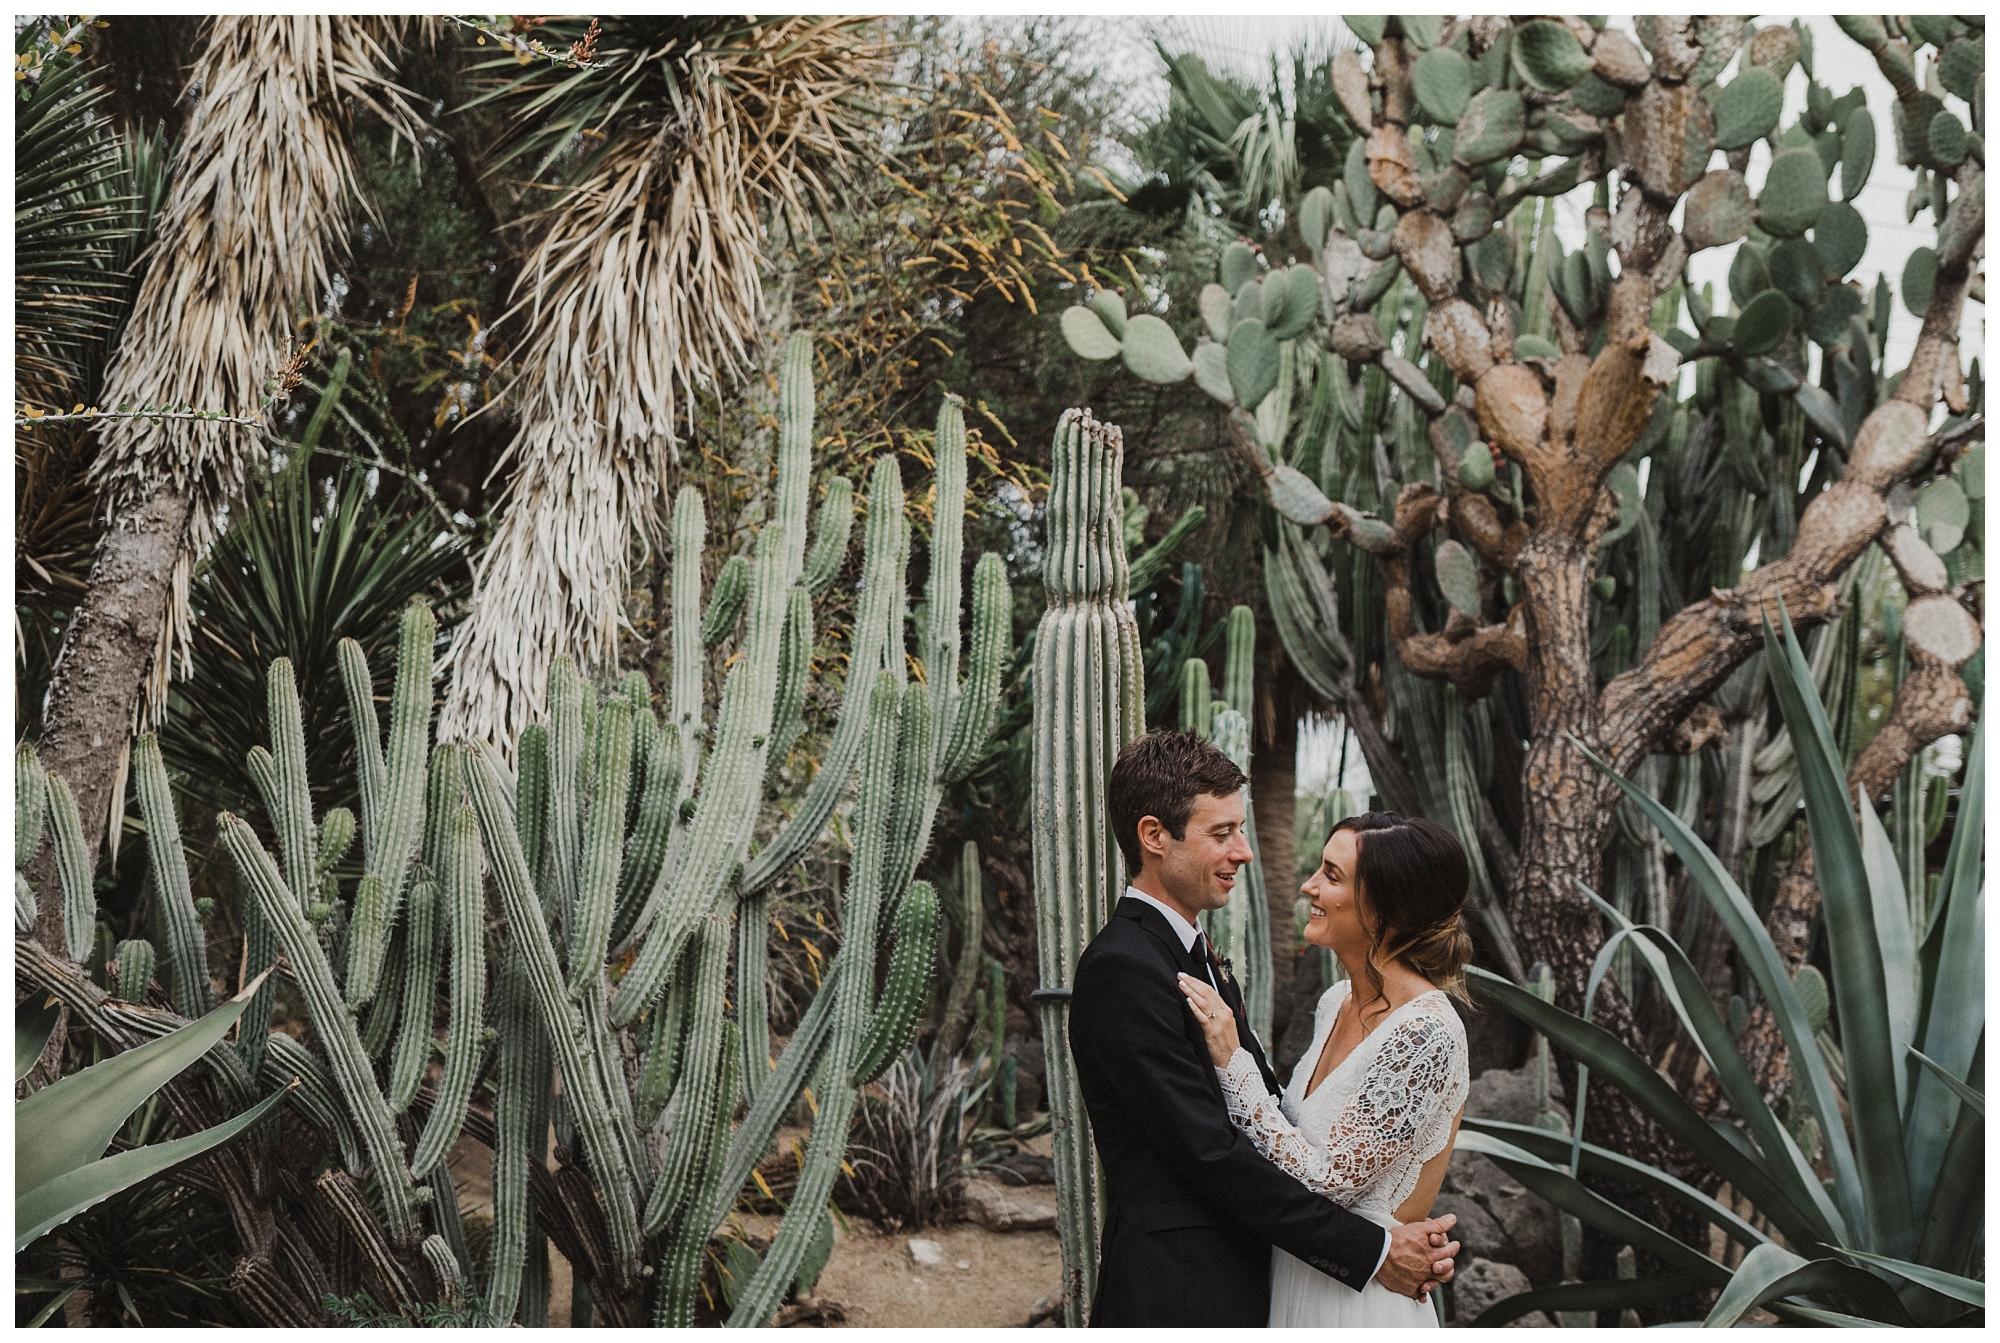 Ace Hotel Wedding Palm Springs (39).jpg